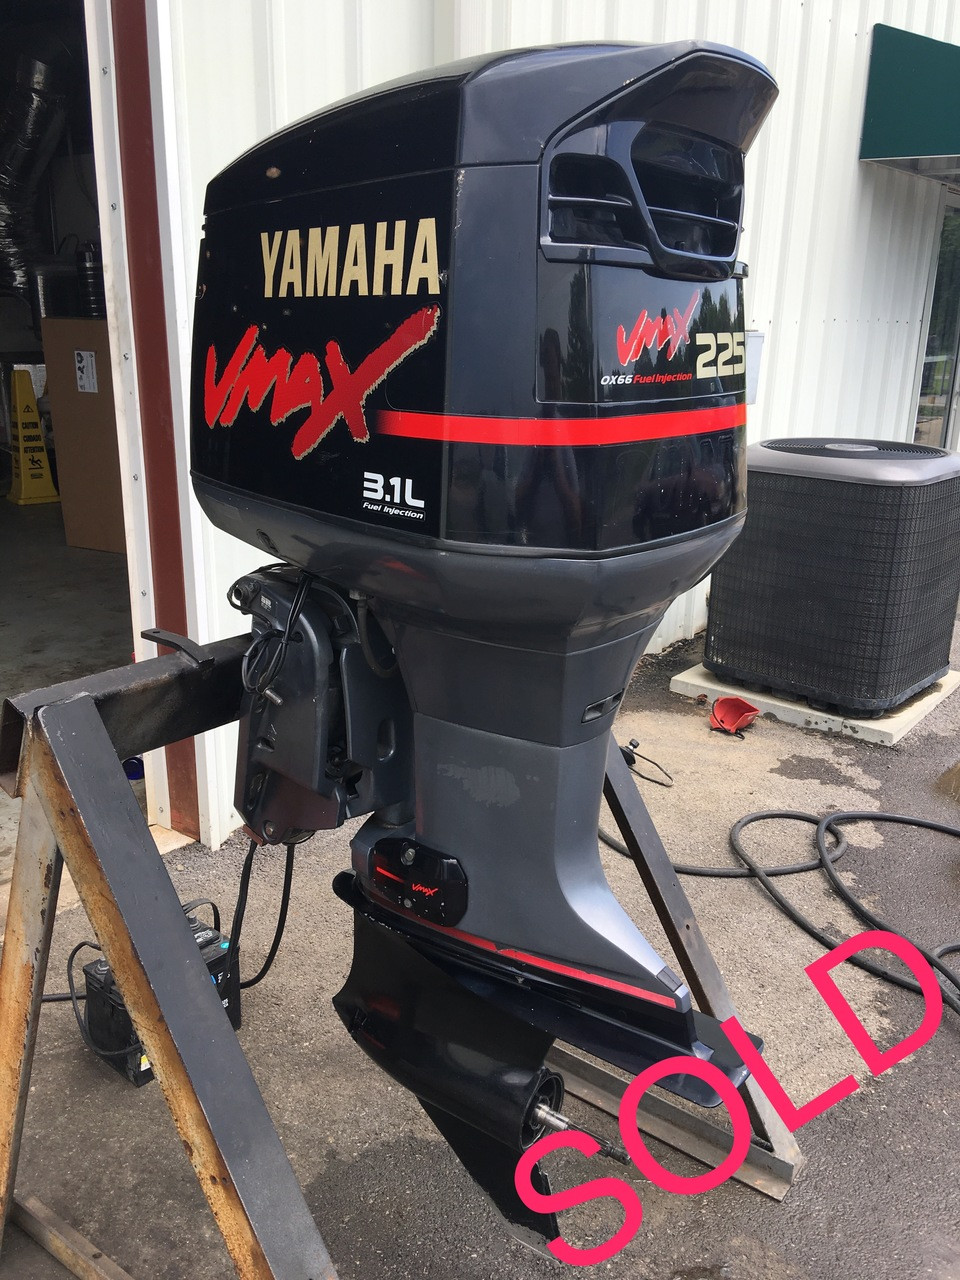 2001 Yamaha VMax 225 HP 3 1L EFI V6 2-Stroke 20